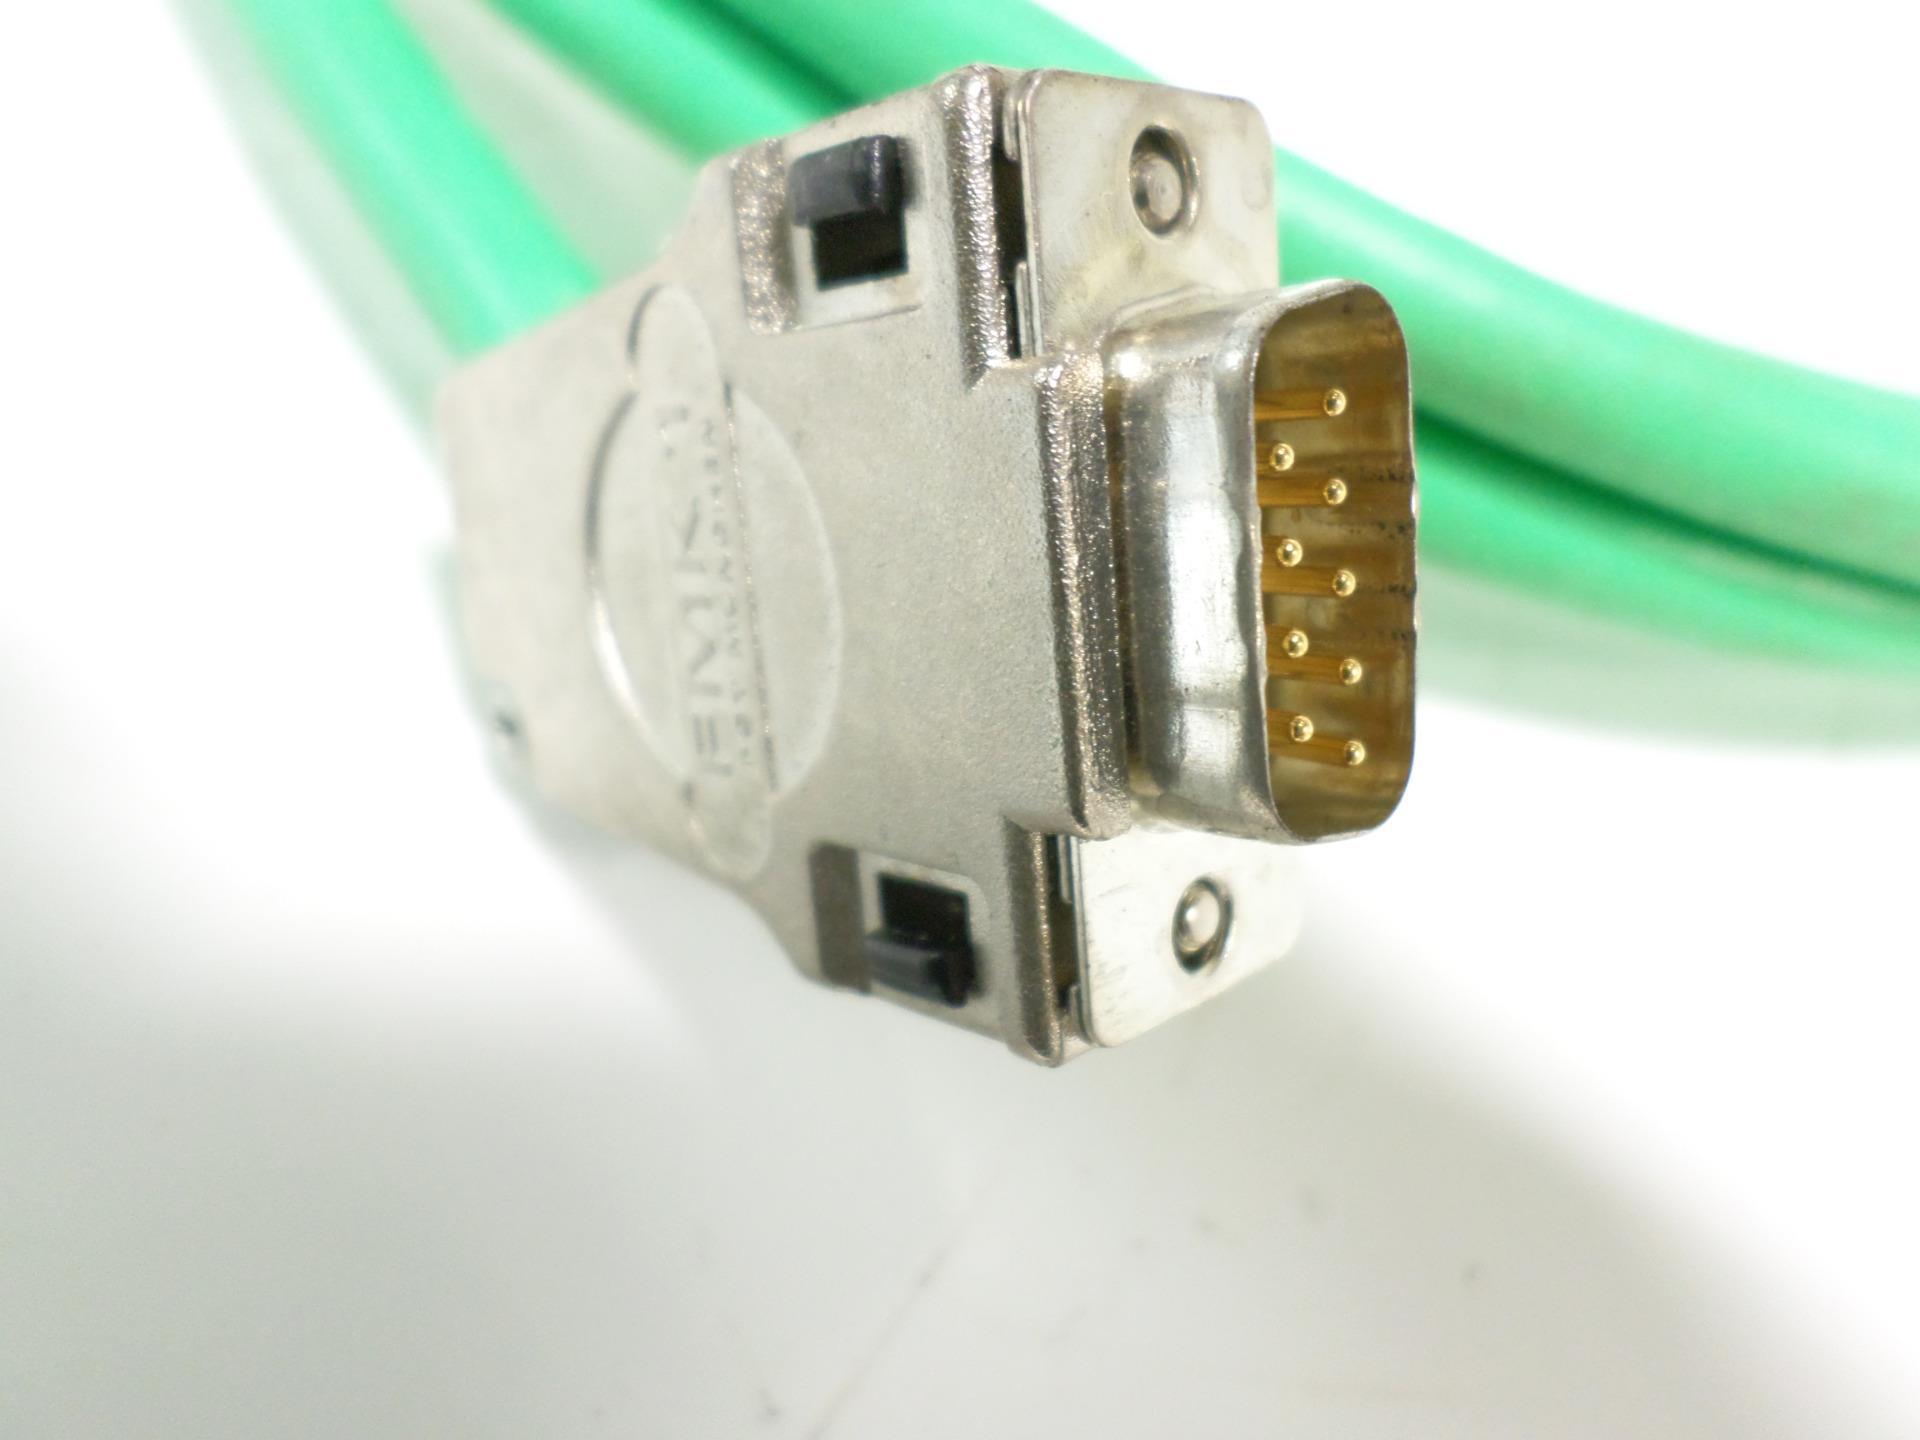 CABLE E42256 AWM STYLE 20235 | eBay